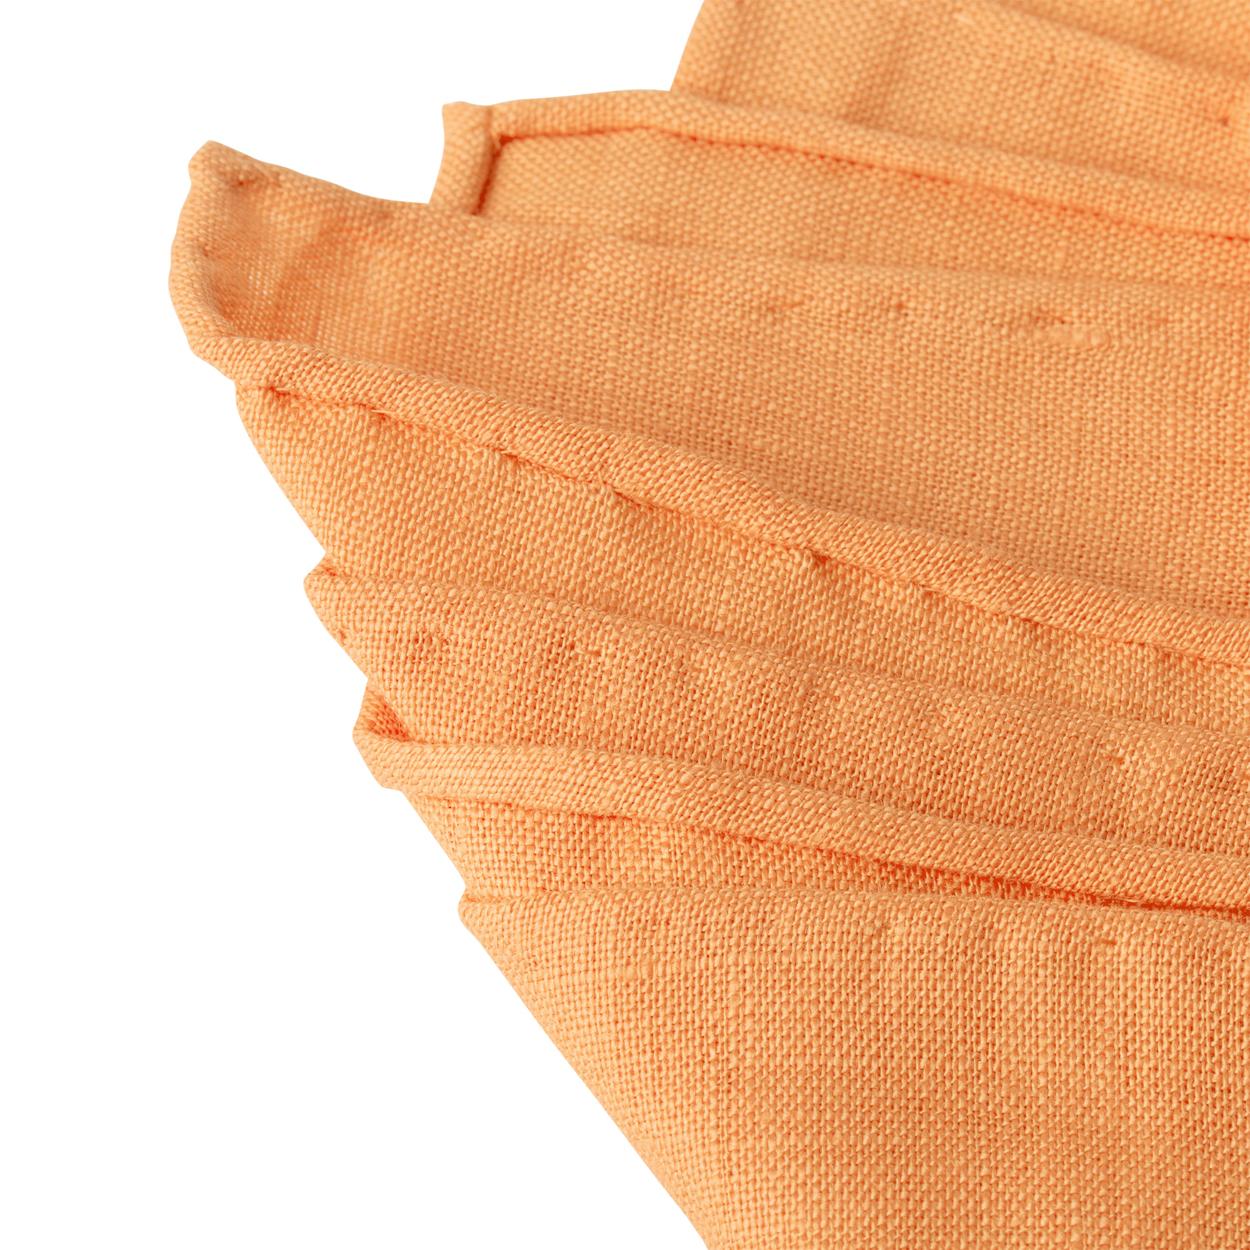 Jacob-Alexander-Linen-Handrolled-15-034-x-15-034-Pocket-Square-Hanky thumbnail 25